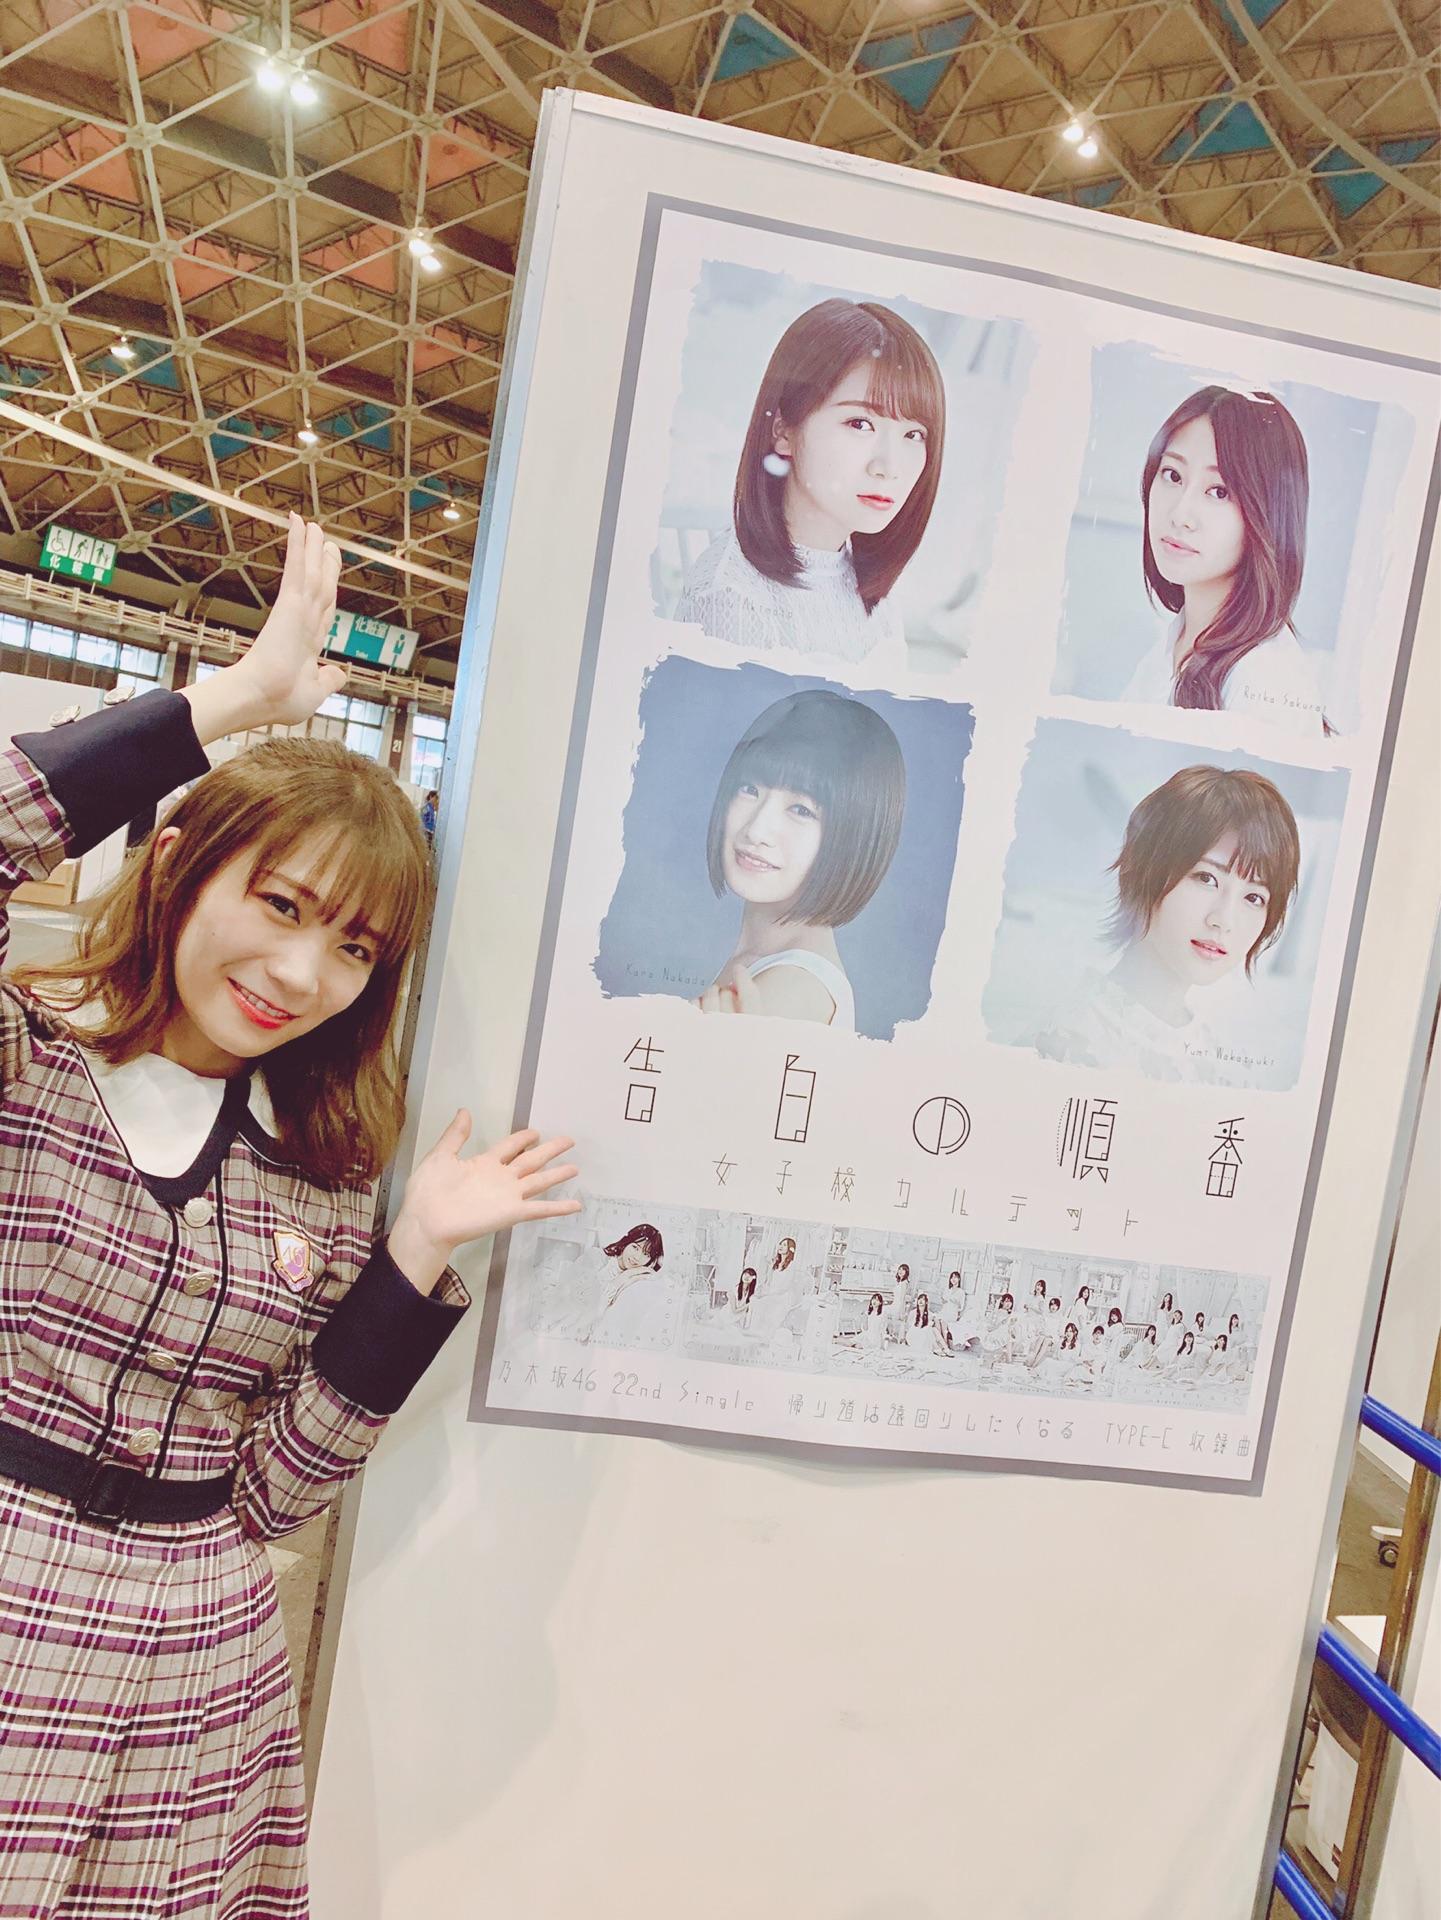 Media 2024773 by Akimoto Manatsu